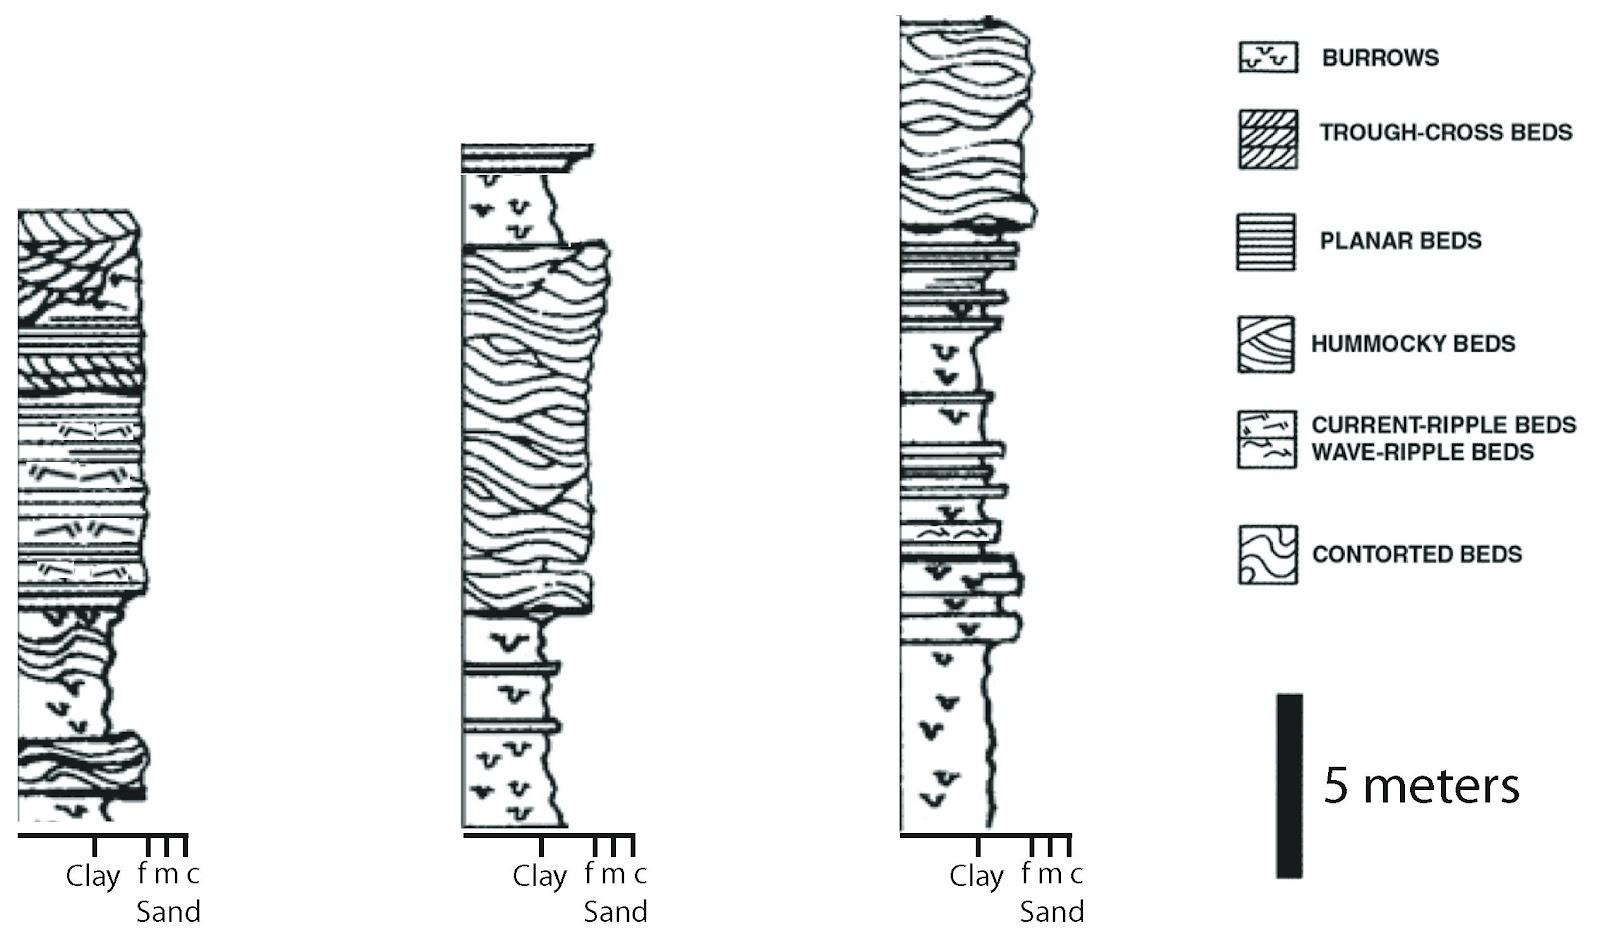 Dawn S Sed Strat Lecture Notes Interpreting Stratigraphic